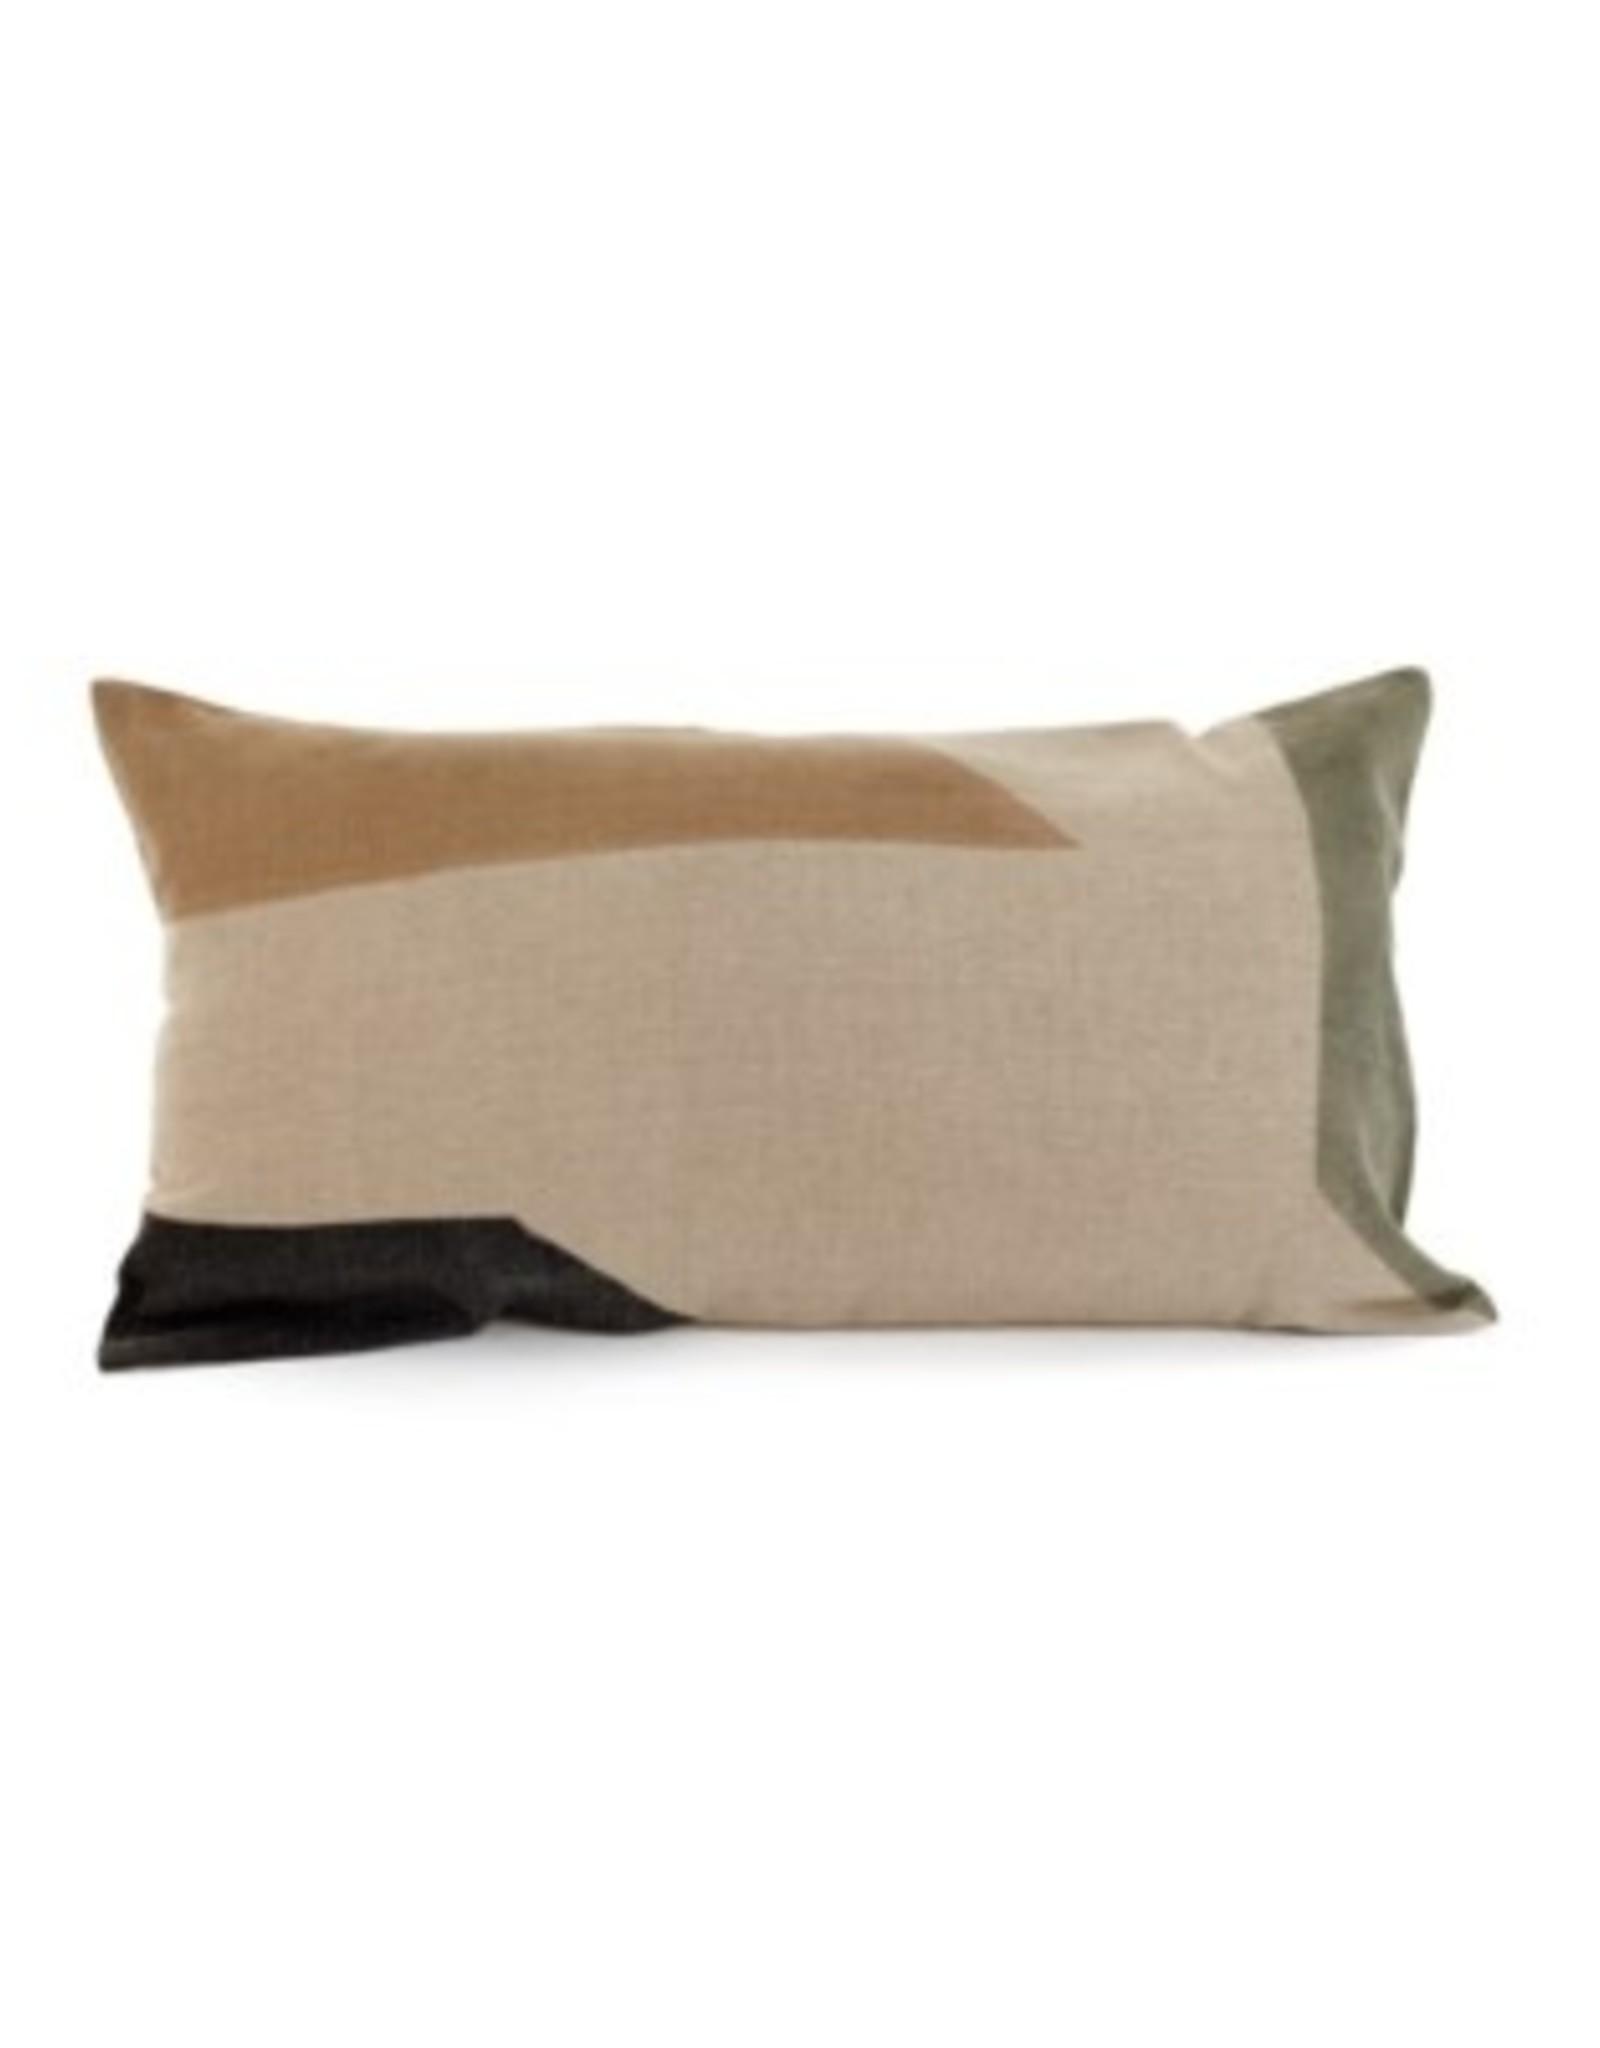 Cushions PC Salazar 12 x 22